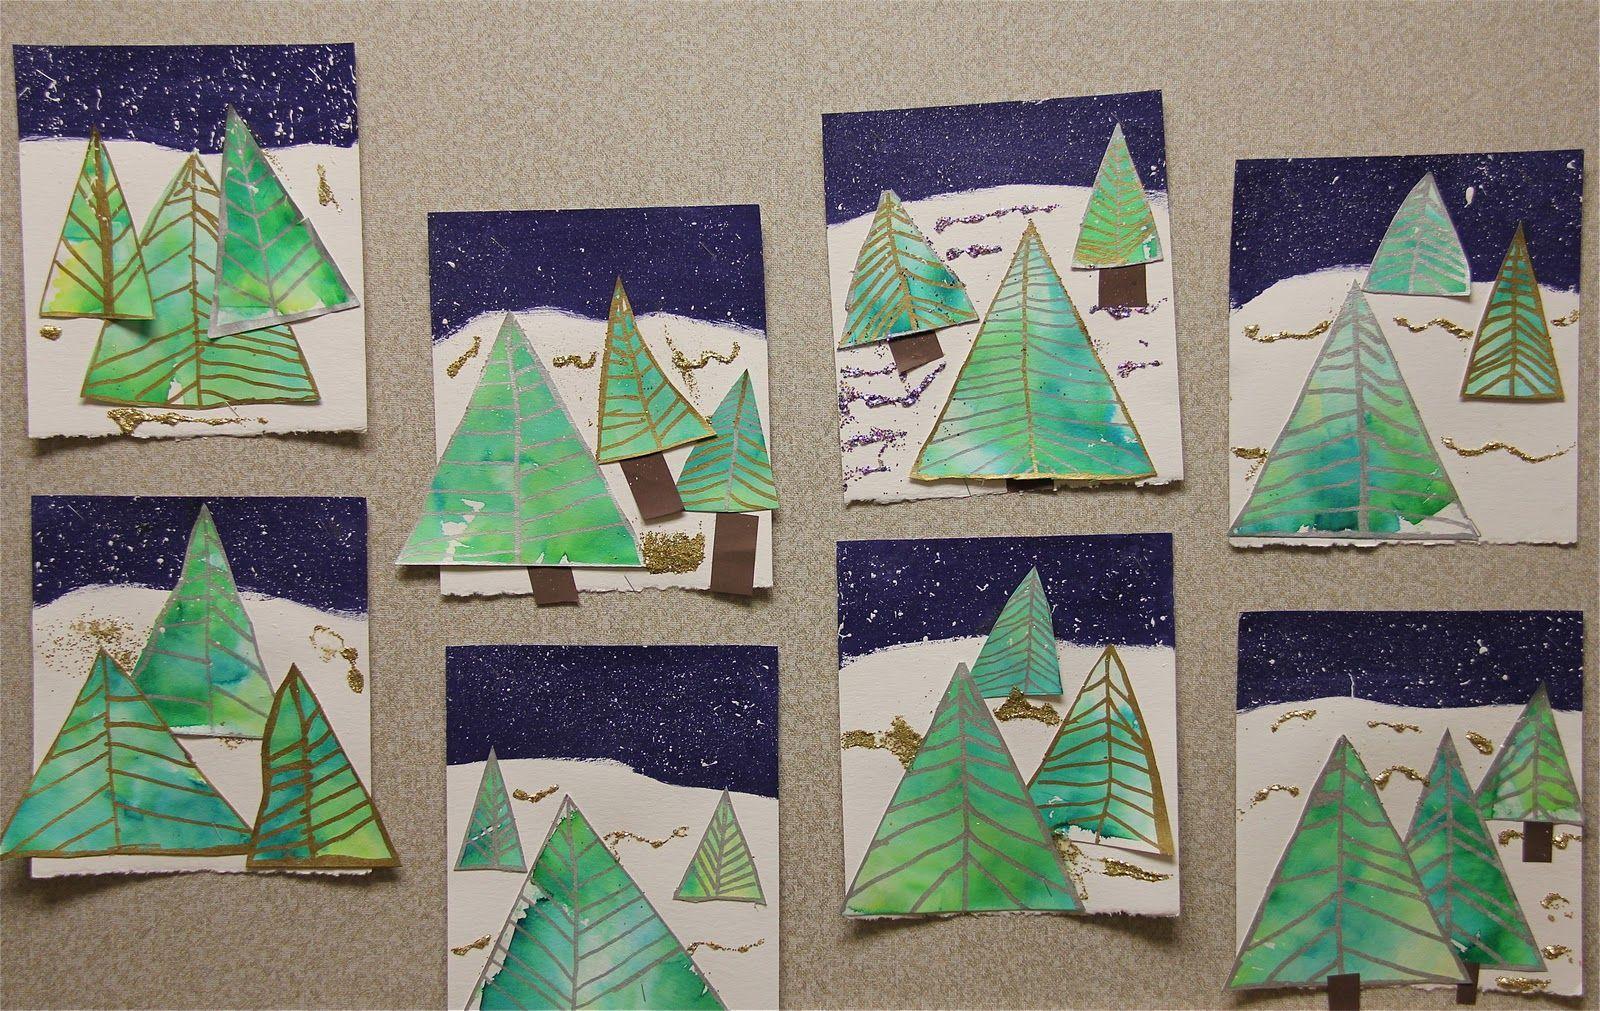 Artz Kiddoz 2nd Graders Tissue Paper Painted Evergreen